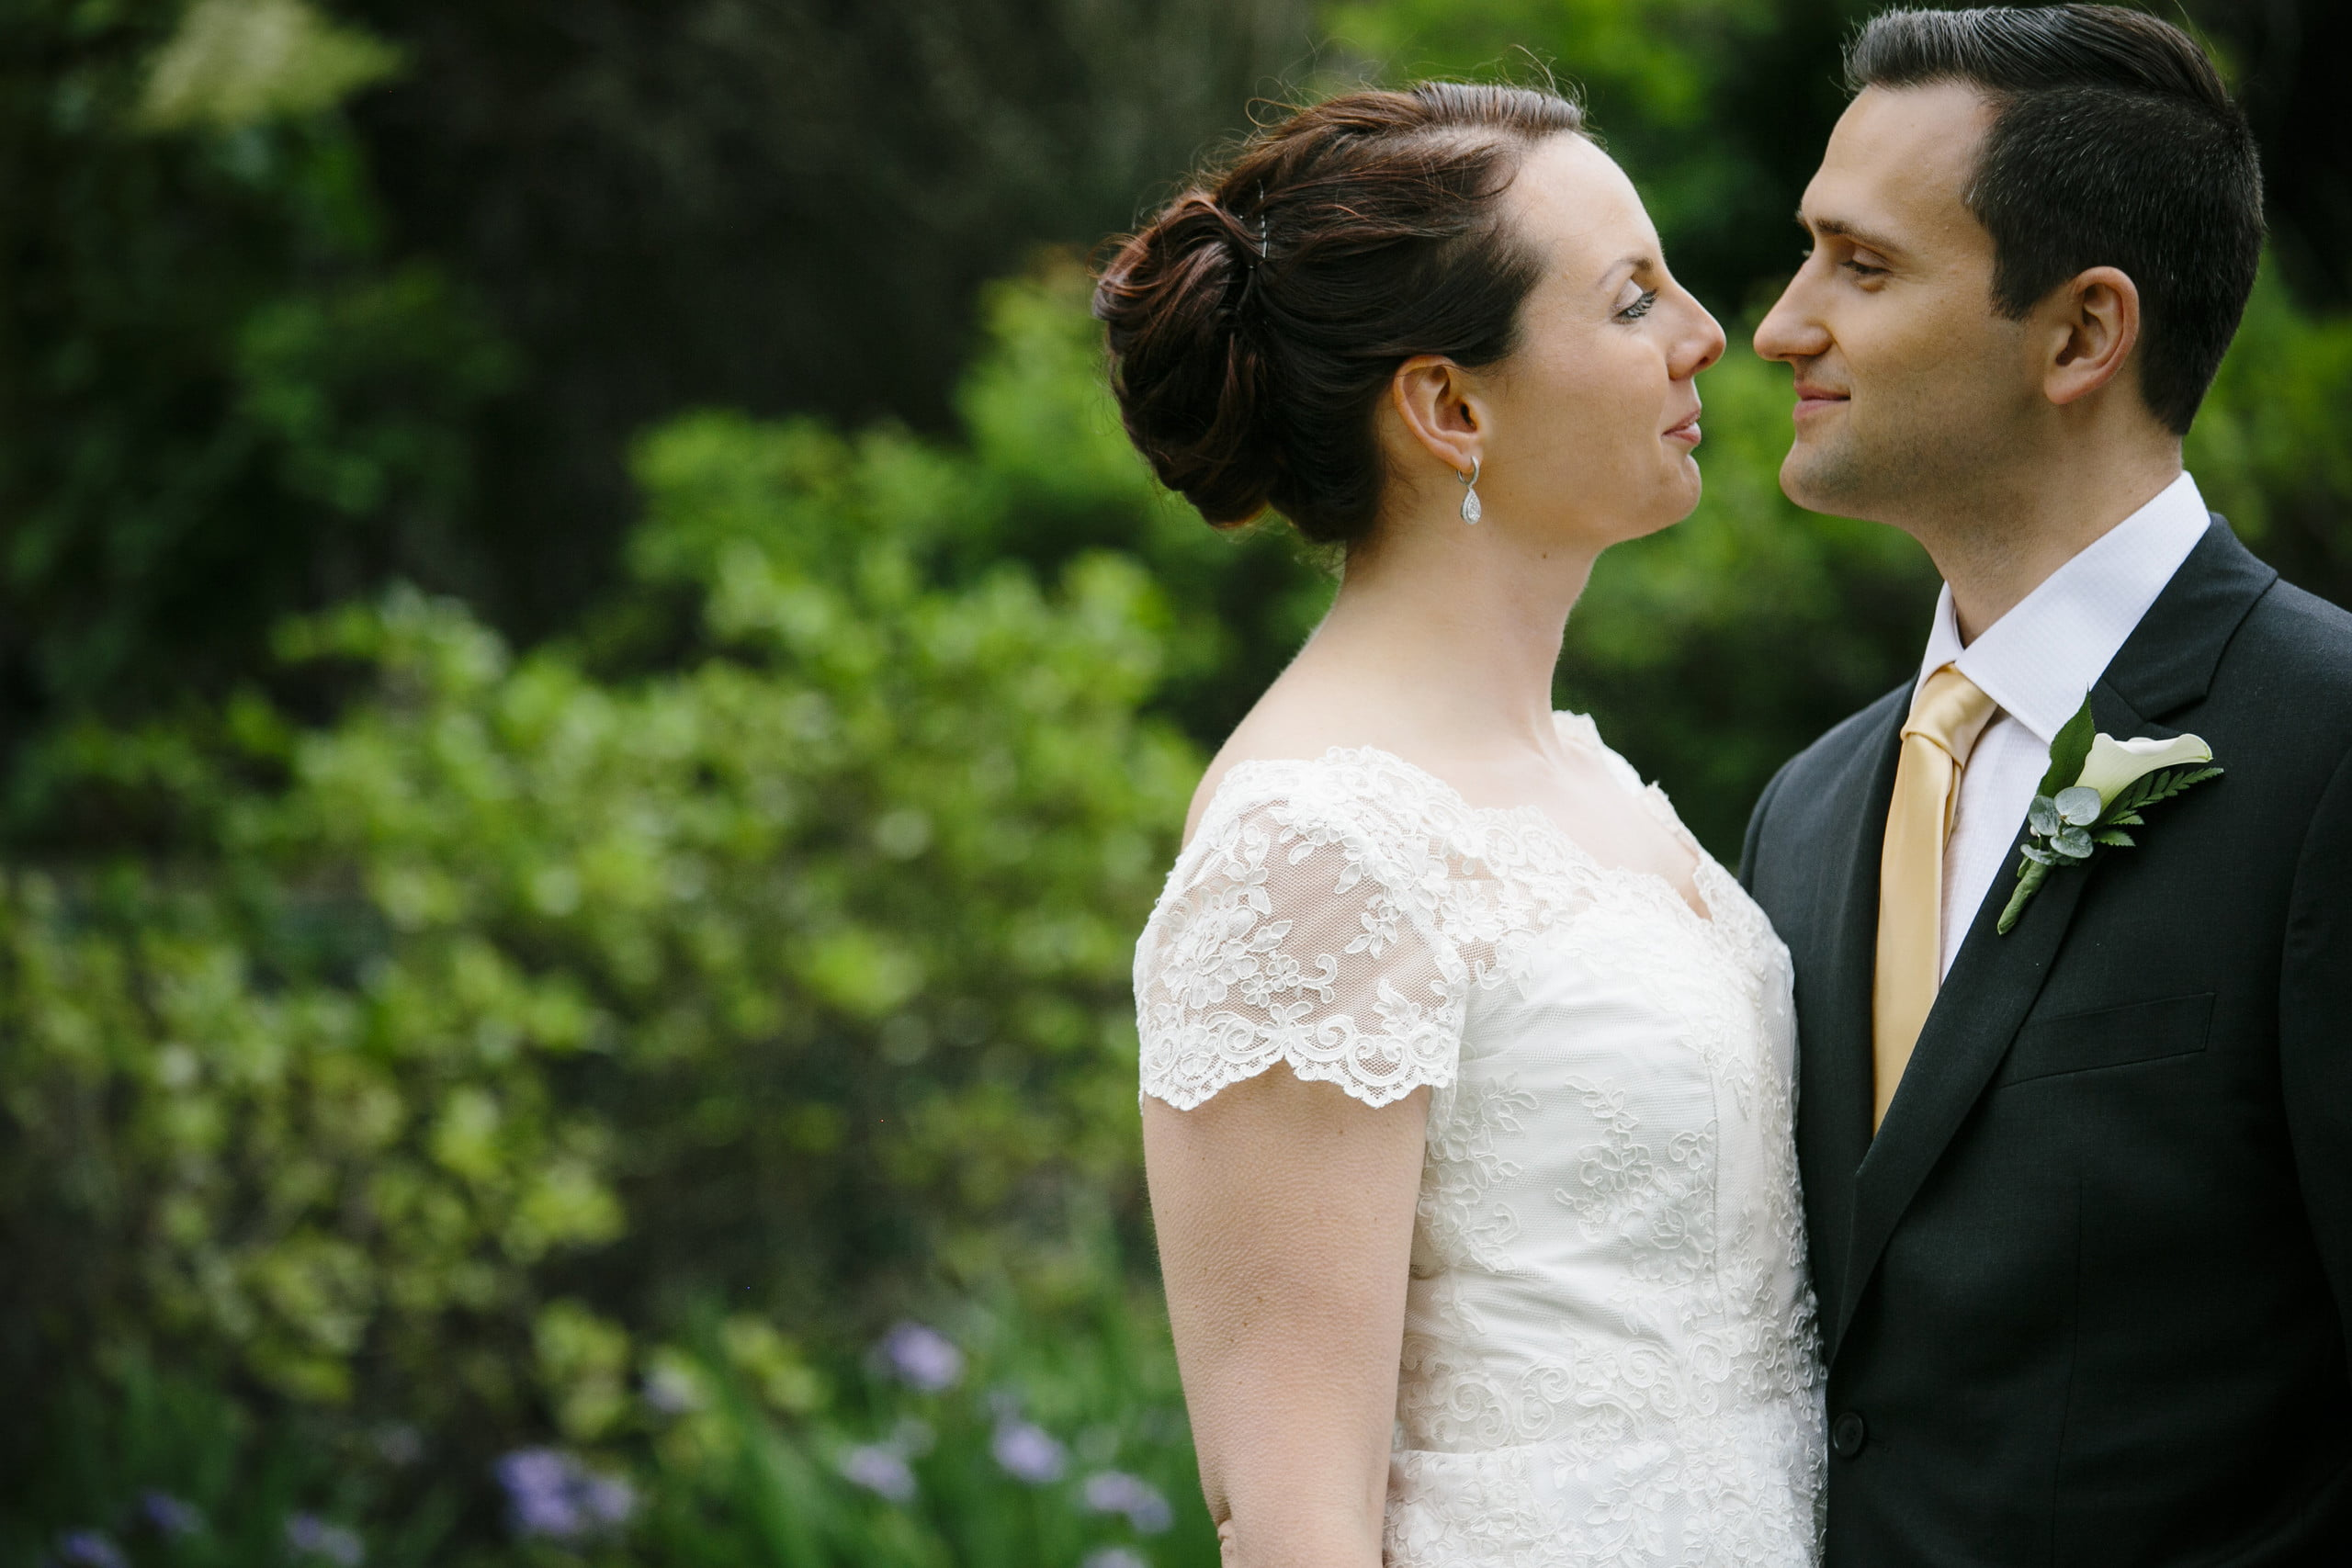 Erin-and-Eldon-Photographer-s-Favorites-0073.jpg